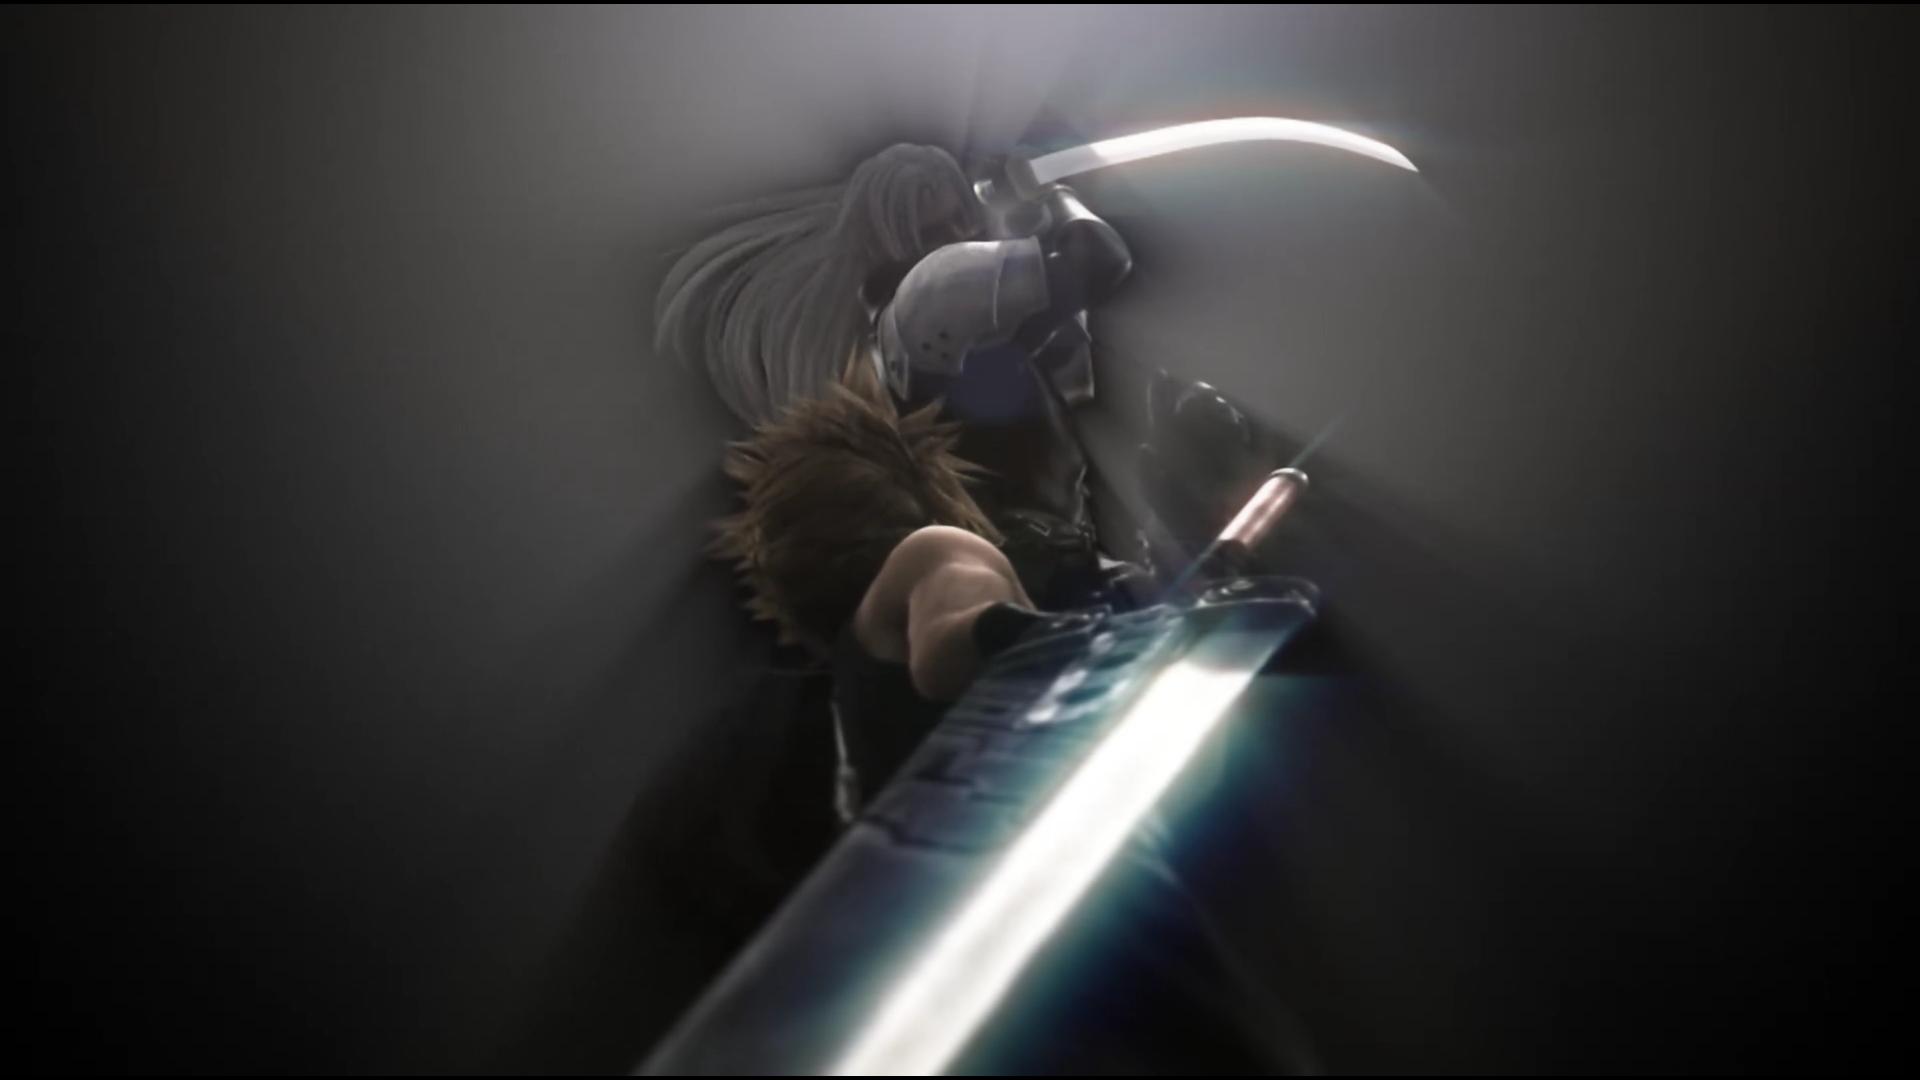 Free Download Final Fantasy 7 Remake Wallpaper Final Fantasy